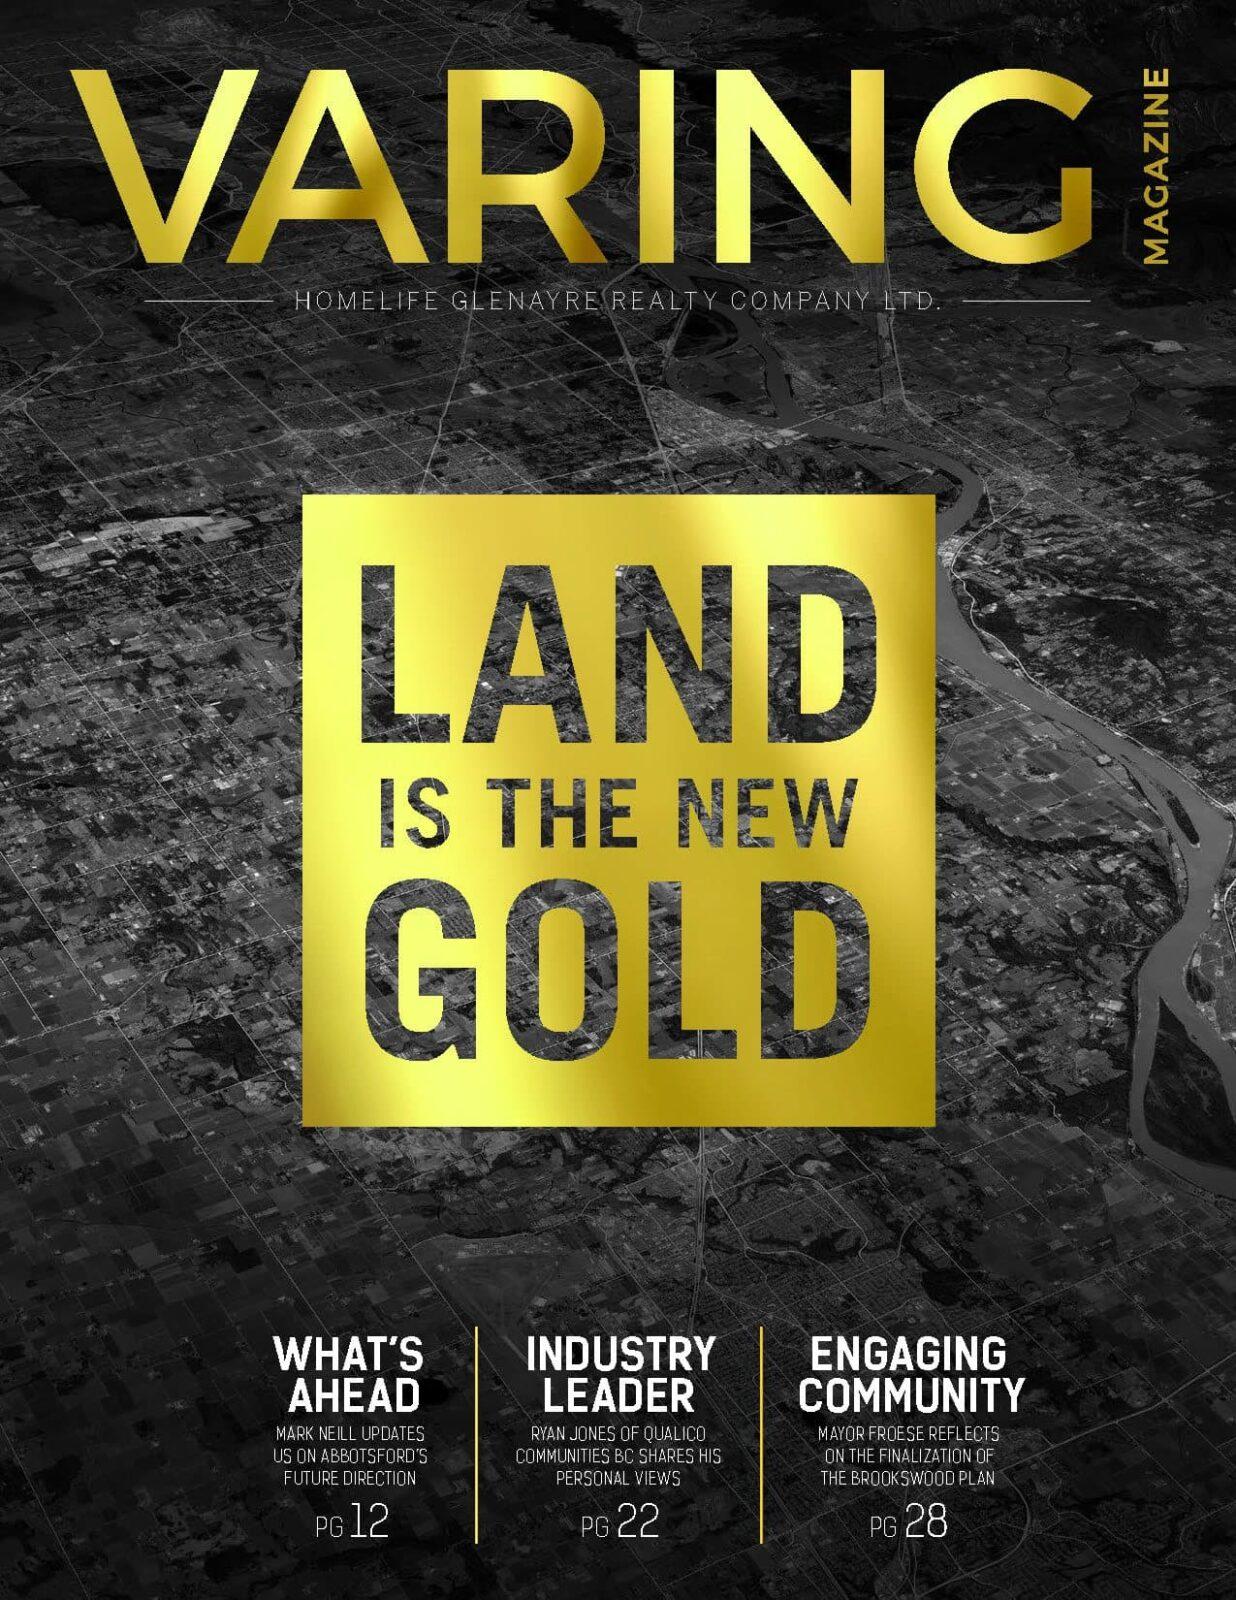 2018 Varing Mgazine cover